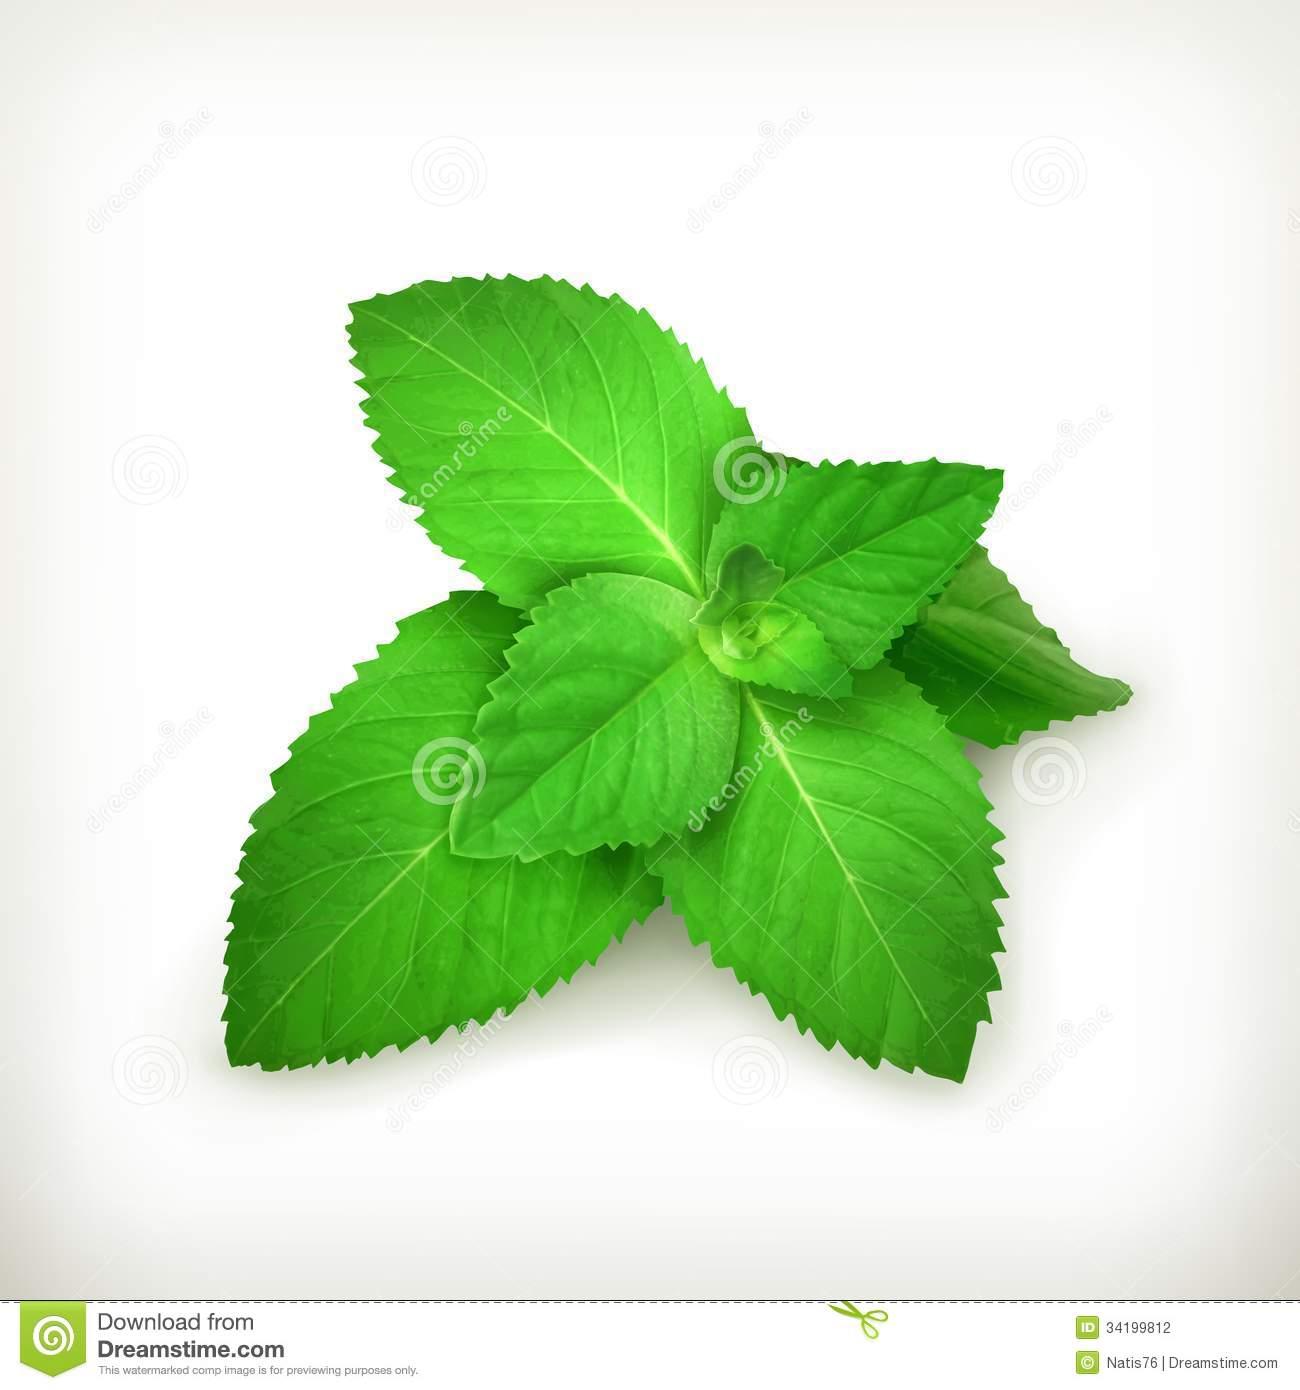 Mint leaf clip art image black and white stock Image Gallery of Mint Leaf Clip Art image black and white stock